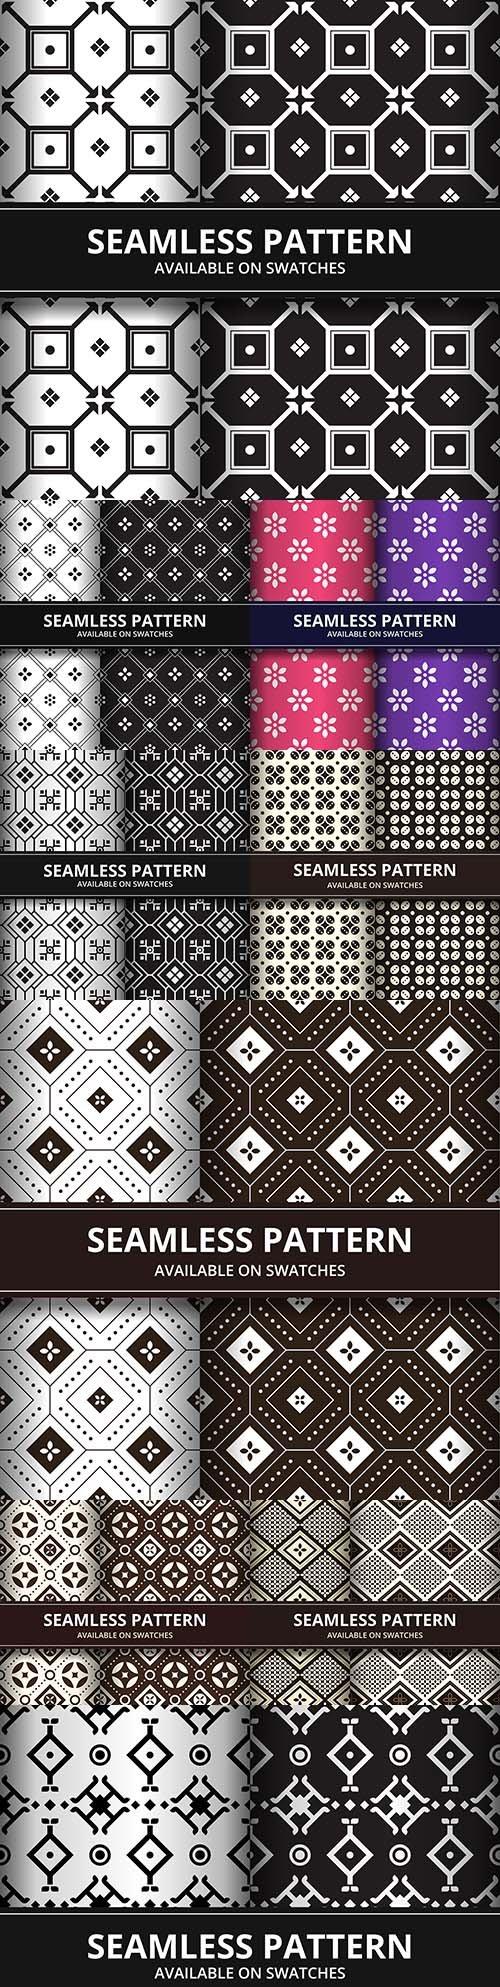 Batik geometry seamless pattern in black and white